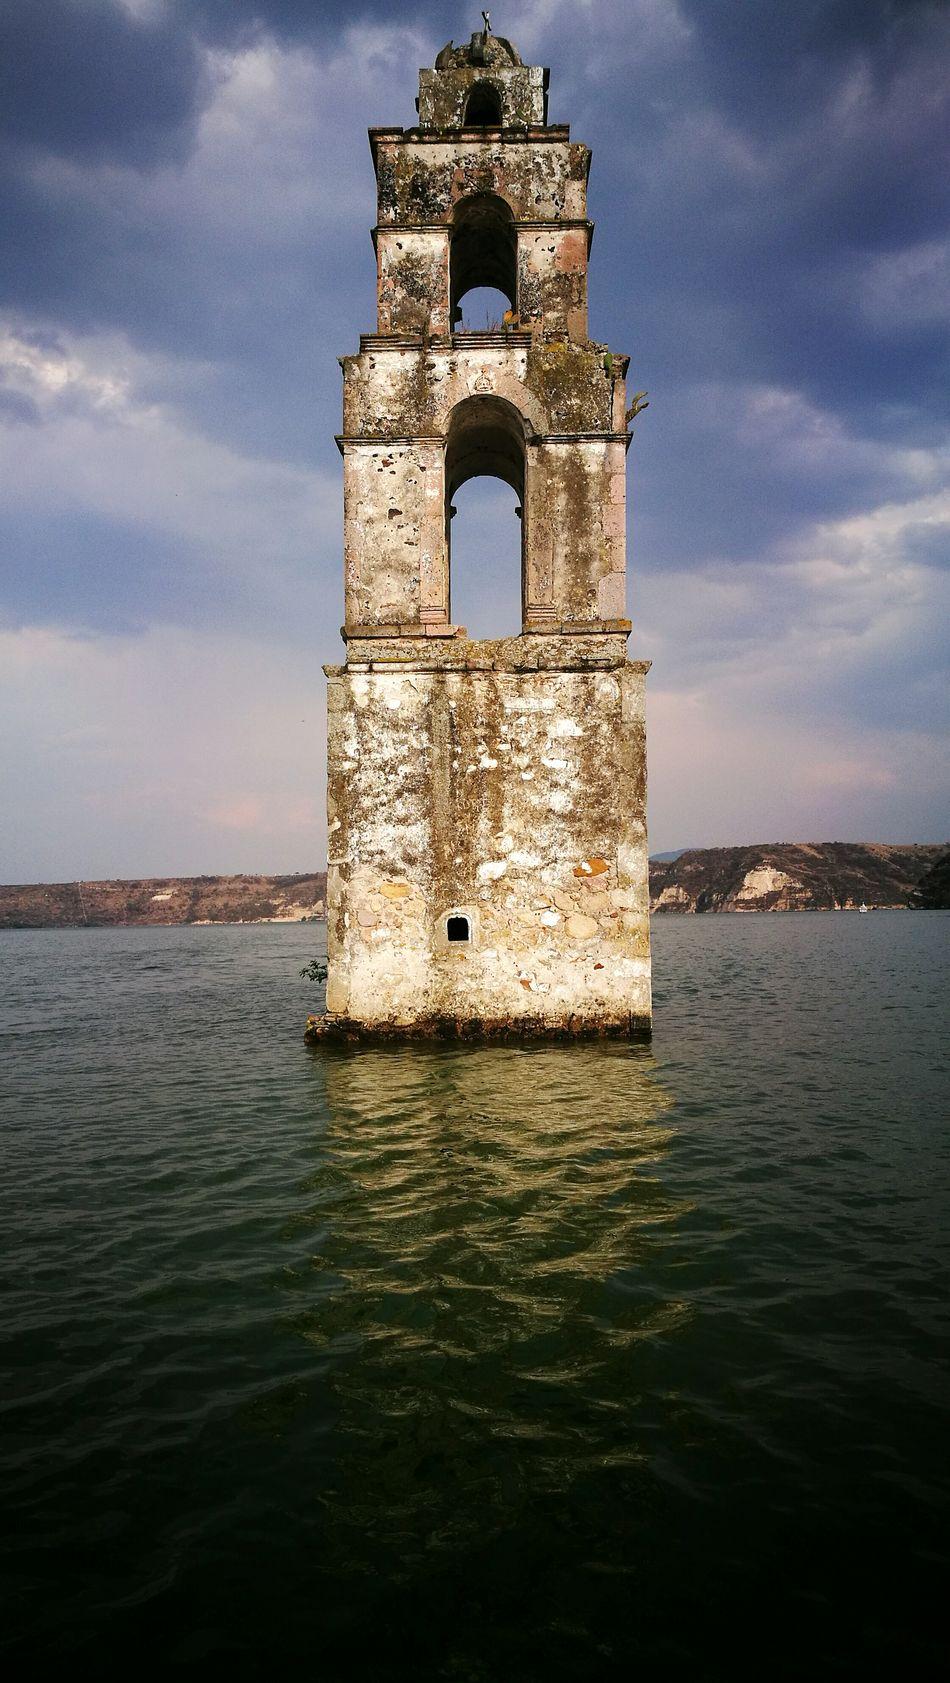 Campanario Torre Inundado Iglesia Church Church Tower Inundations Underwater Mexico Tower Bell Tower